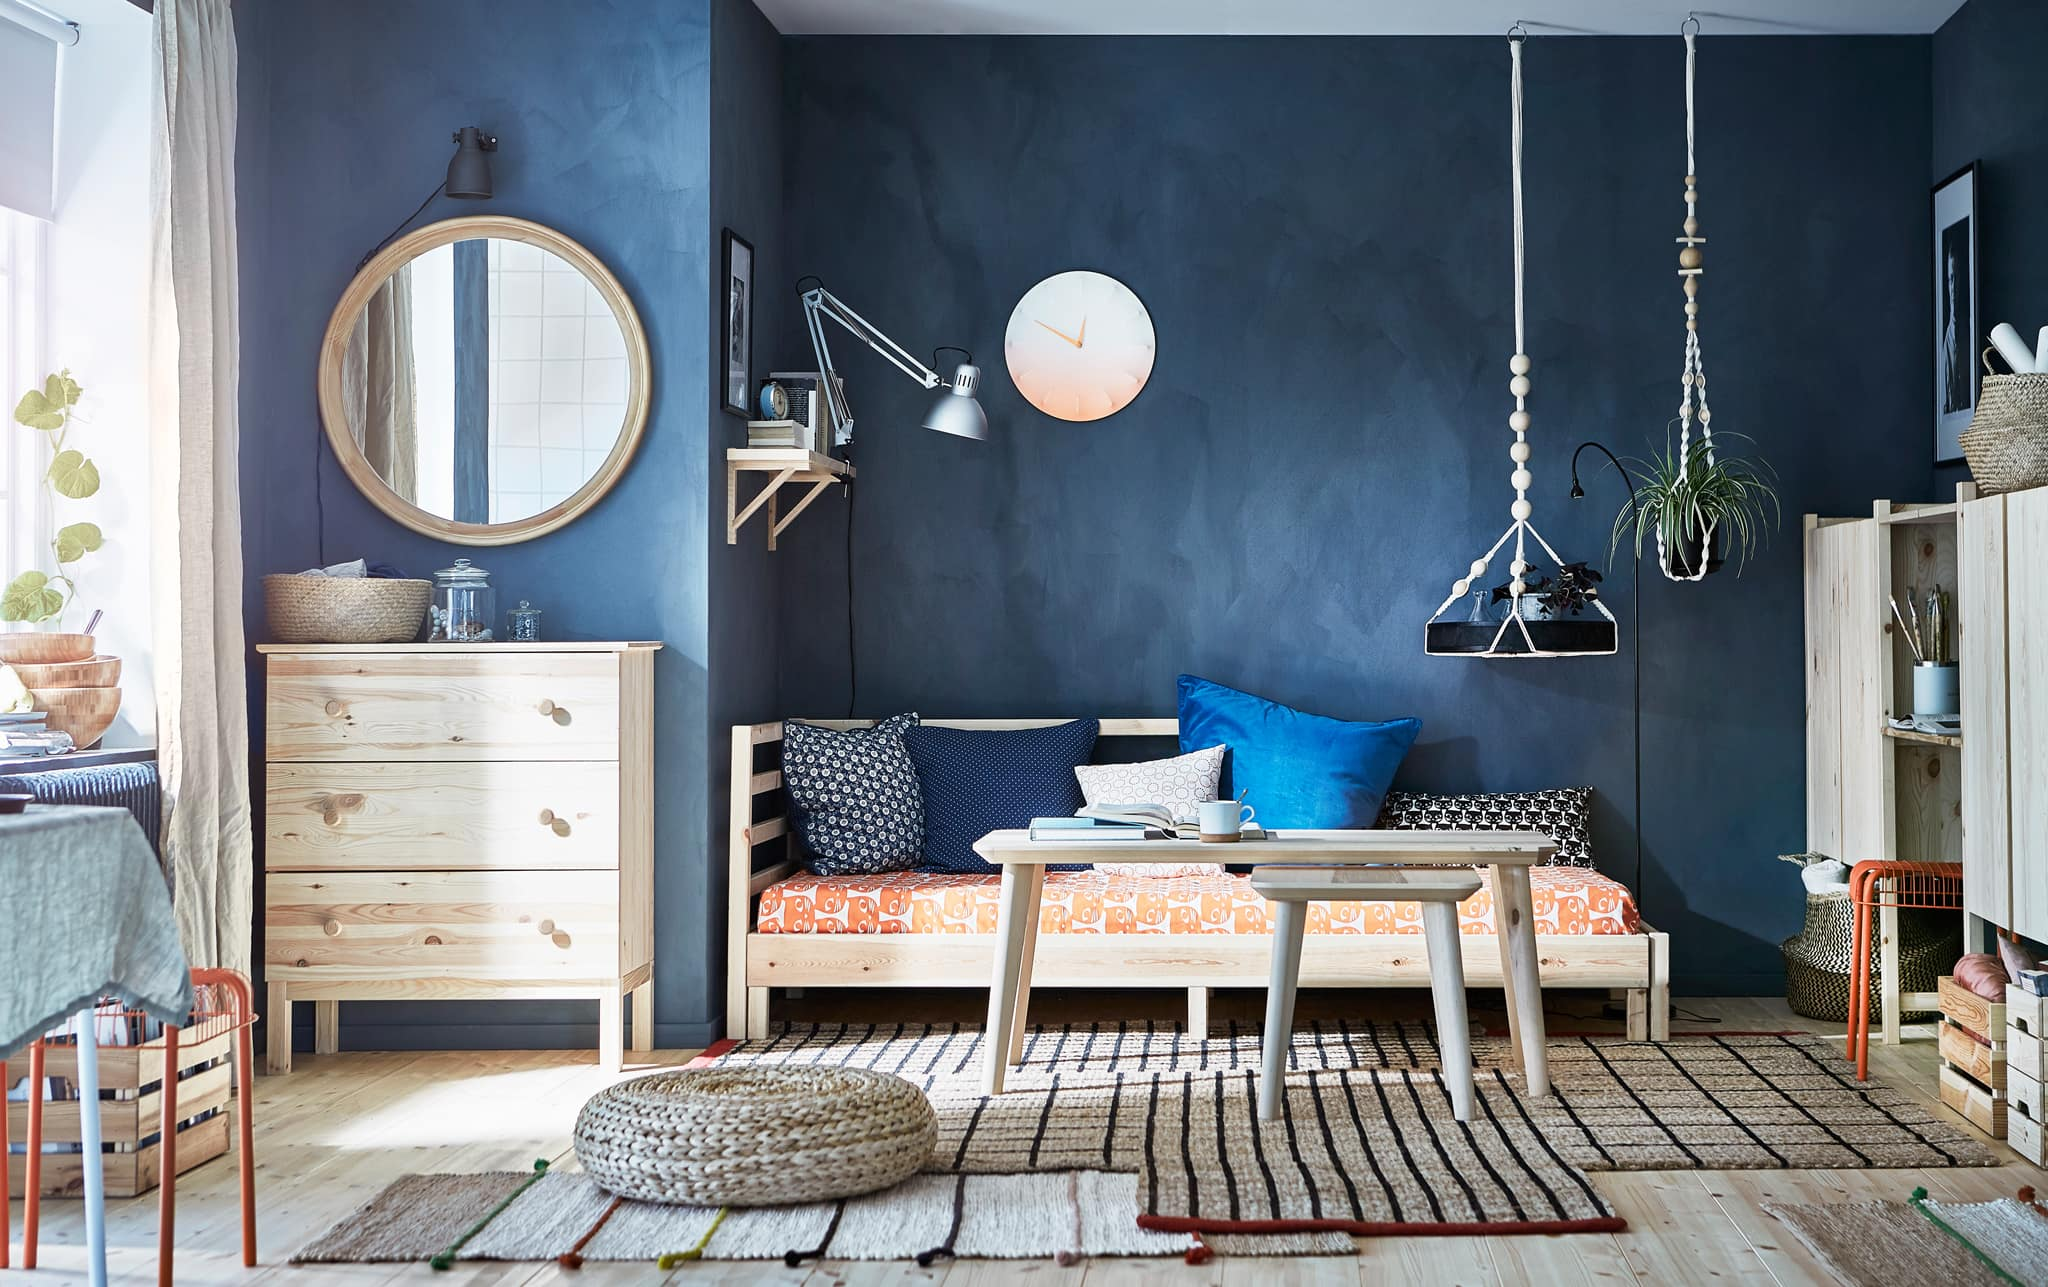 Ikea Dresser Upgrades Diy Tarva Hacks Apartment Therapy